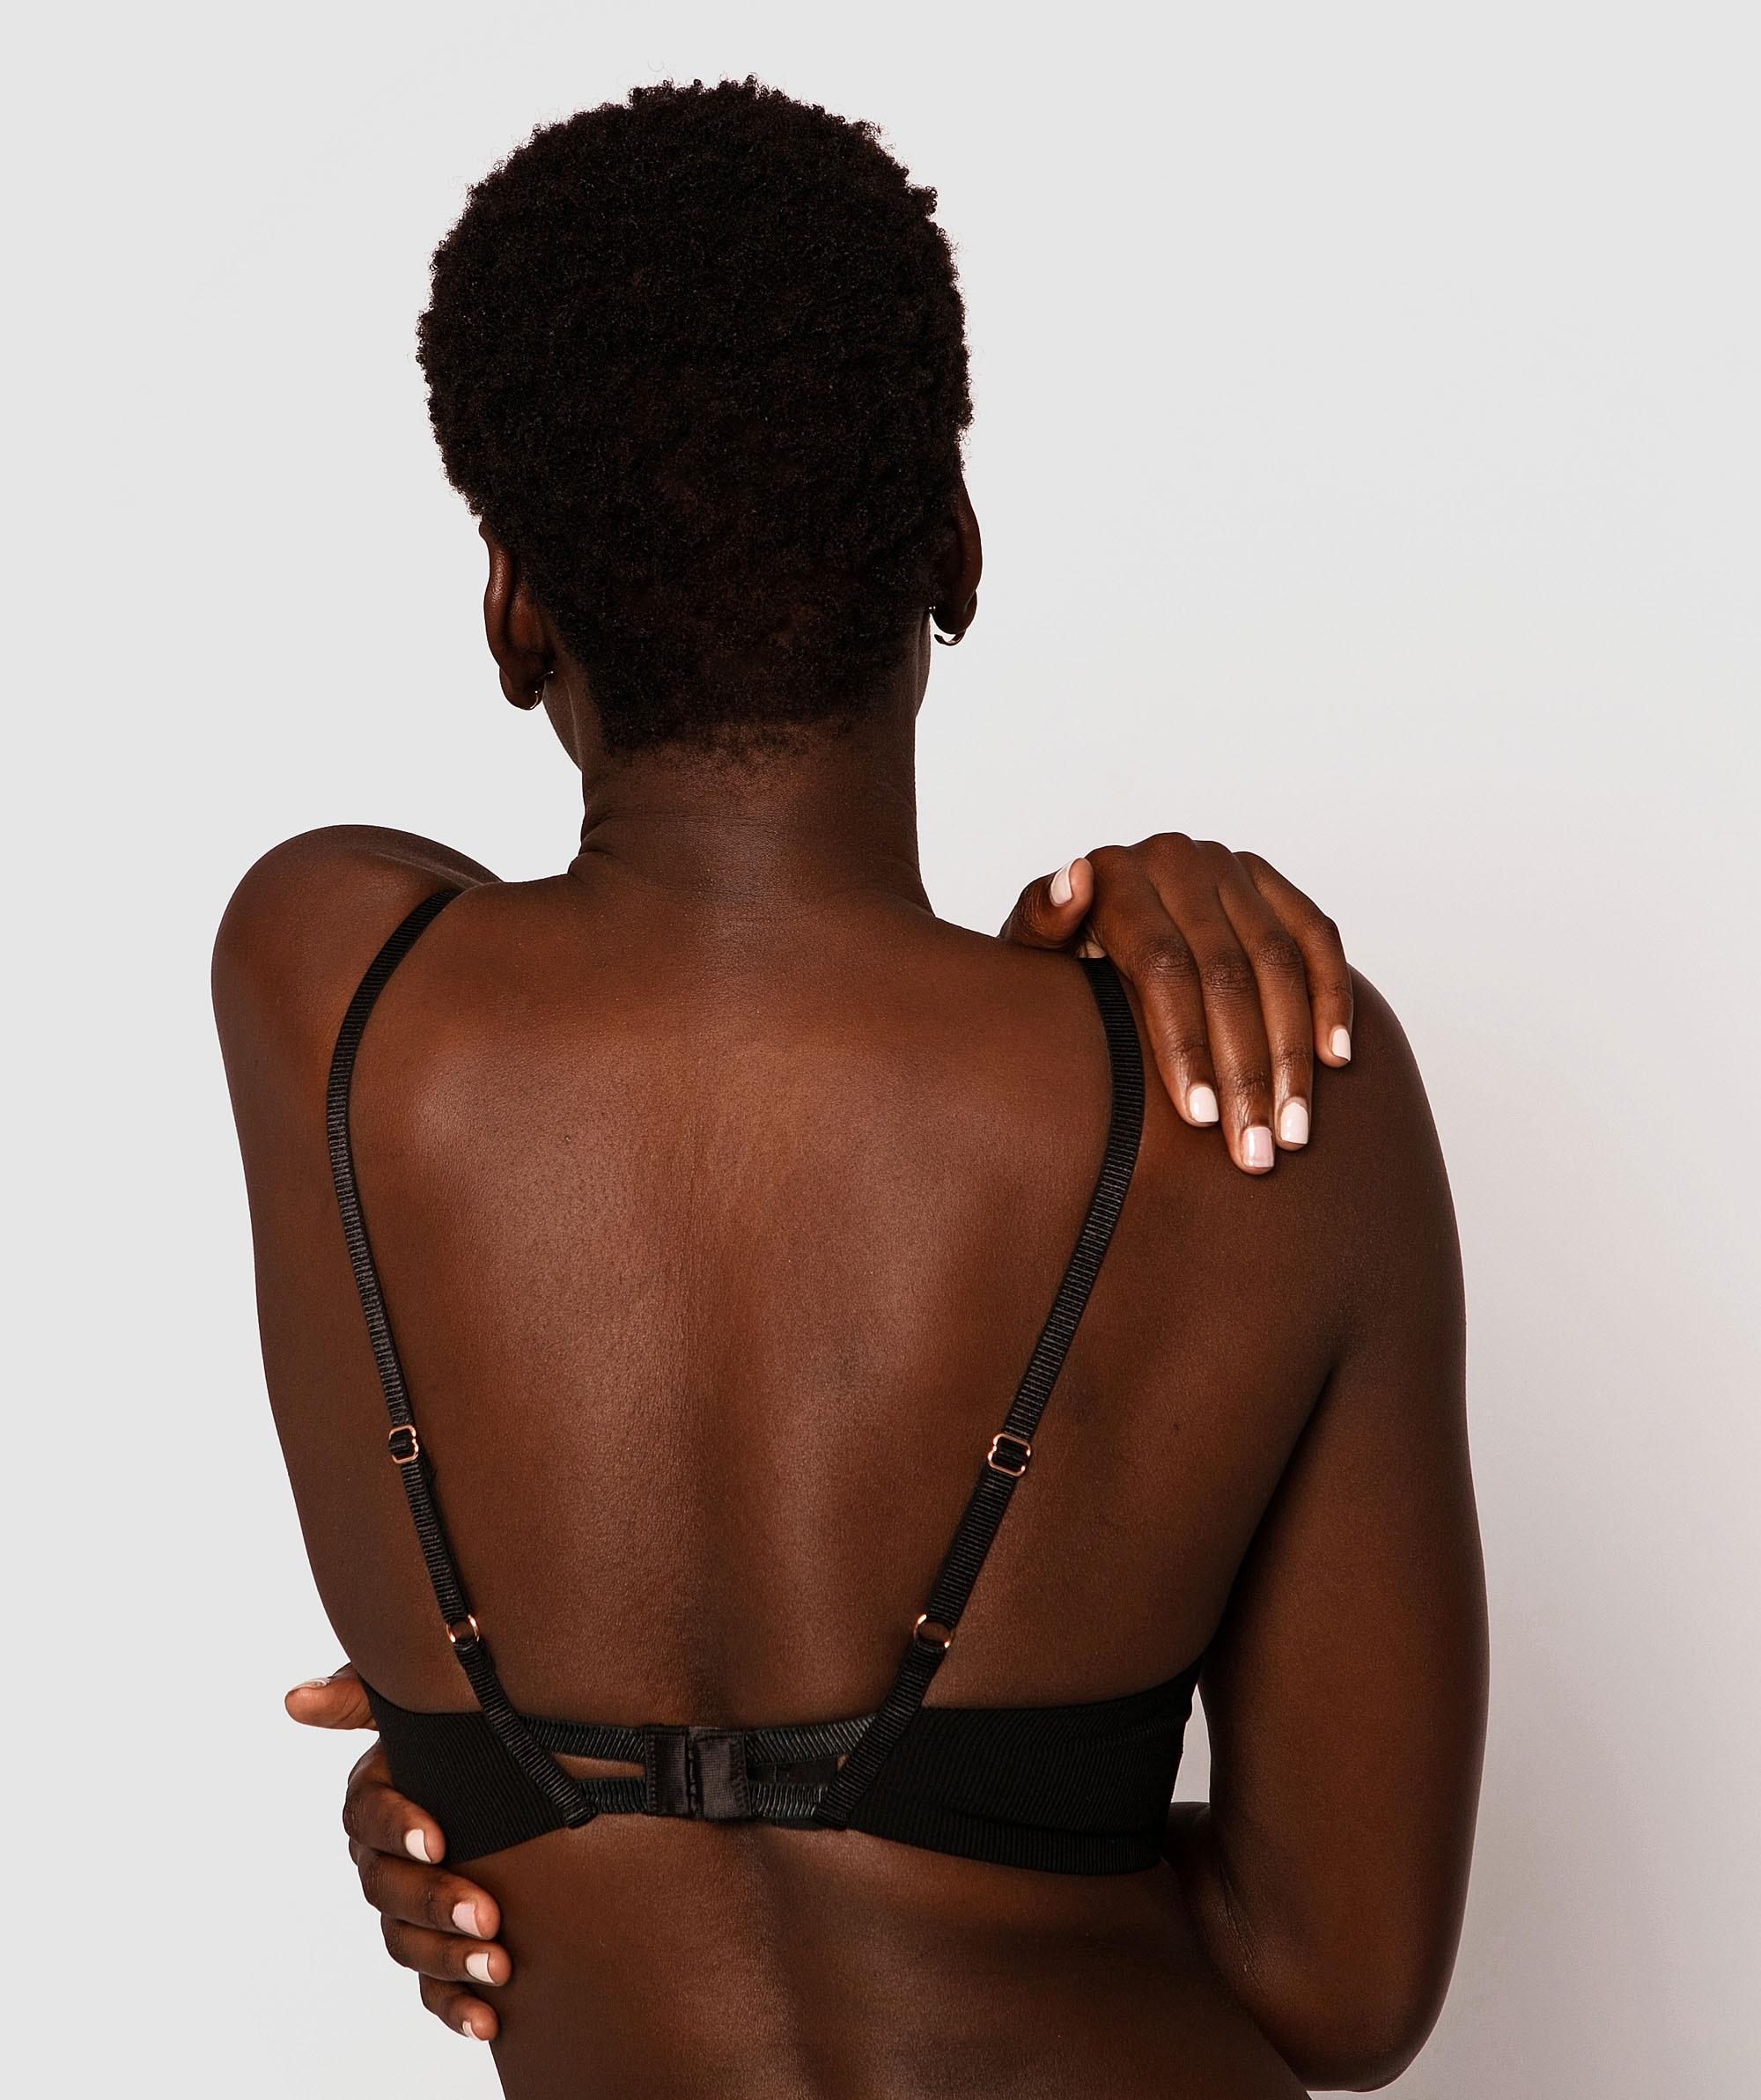 Erika Balconette Push Up Bra - Black